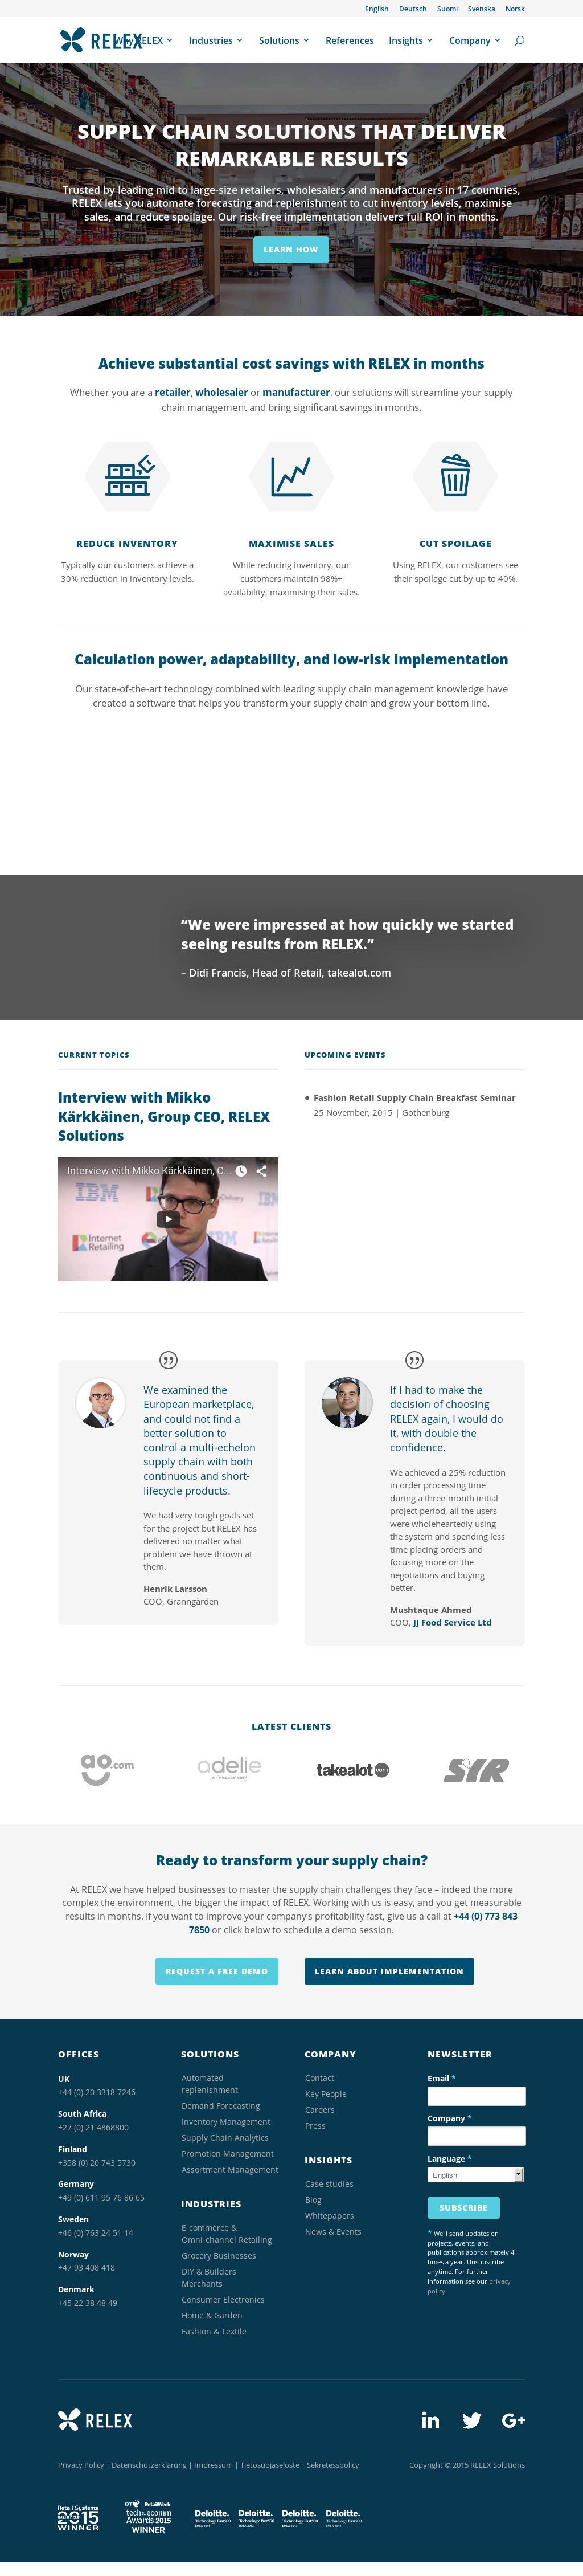 RELEX's Latest News, Blogs, Press Releases & Videos